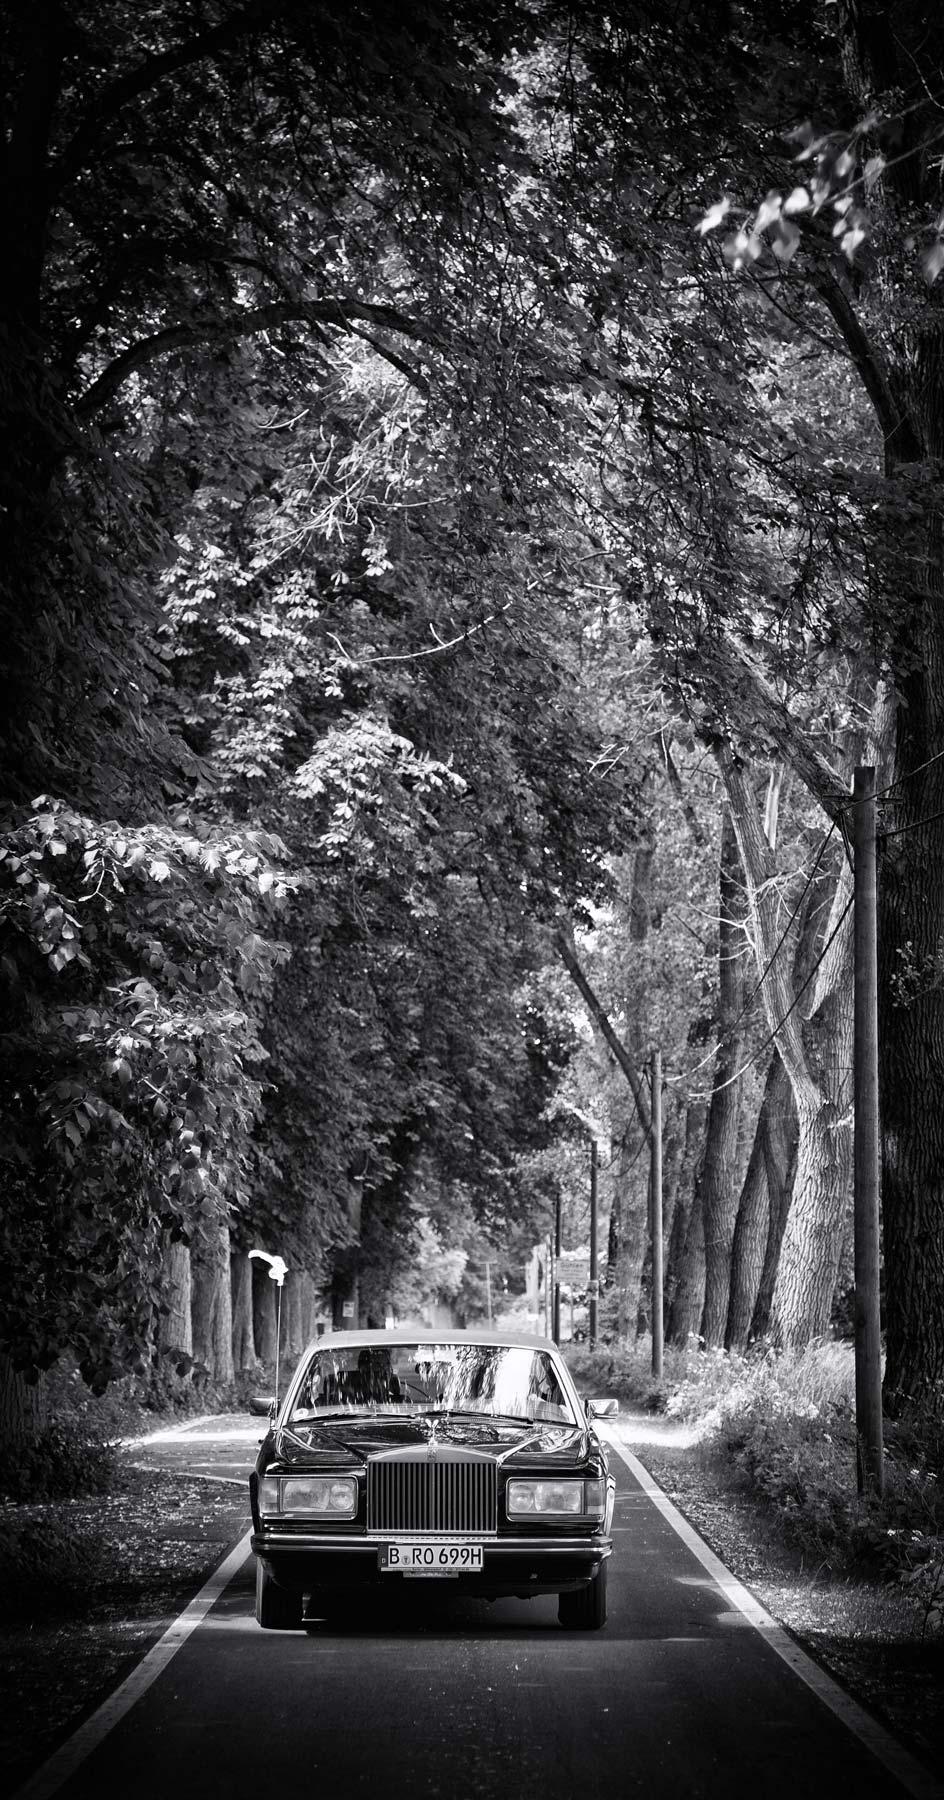 Rolls Royce Hochzeit Limousine Berlin Mike Bielski Hochzeitsfotograf